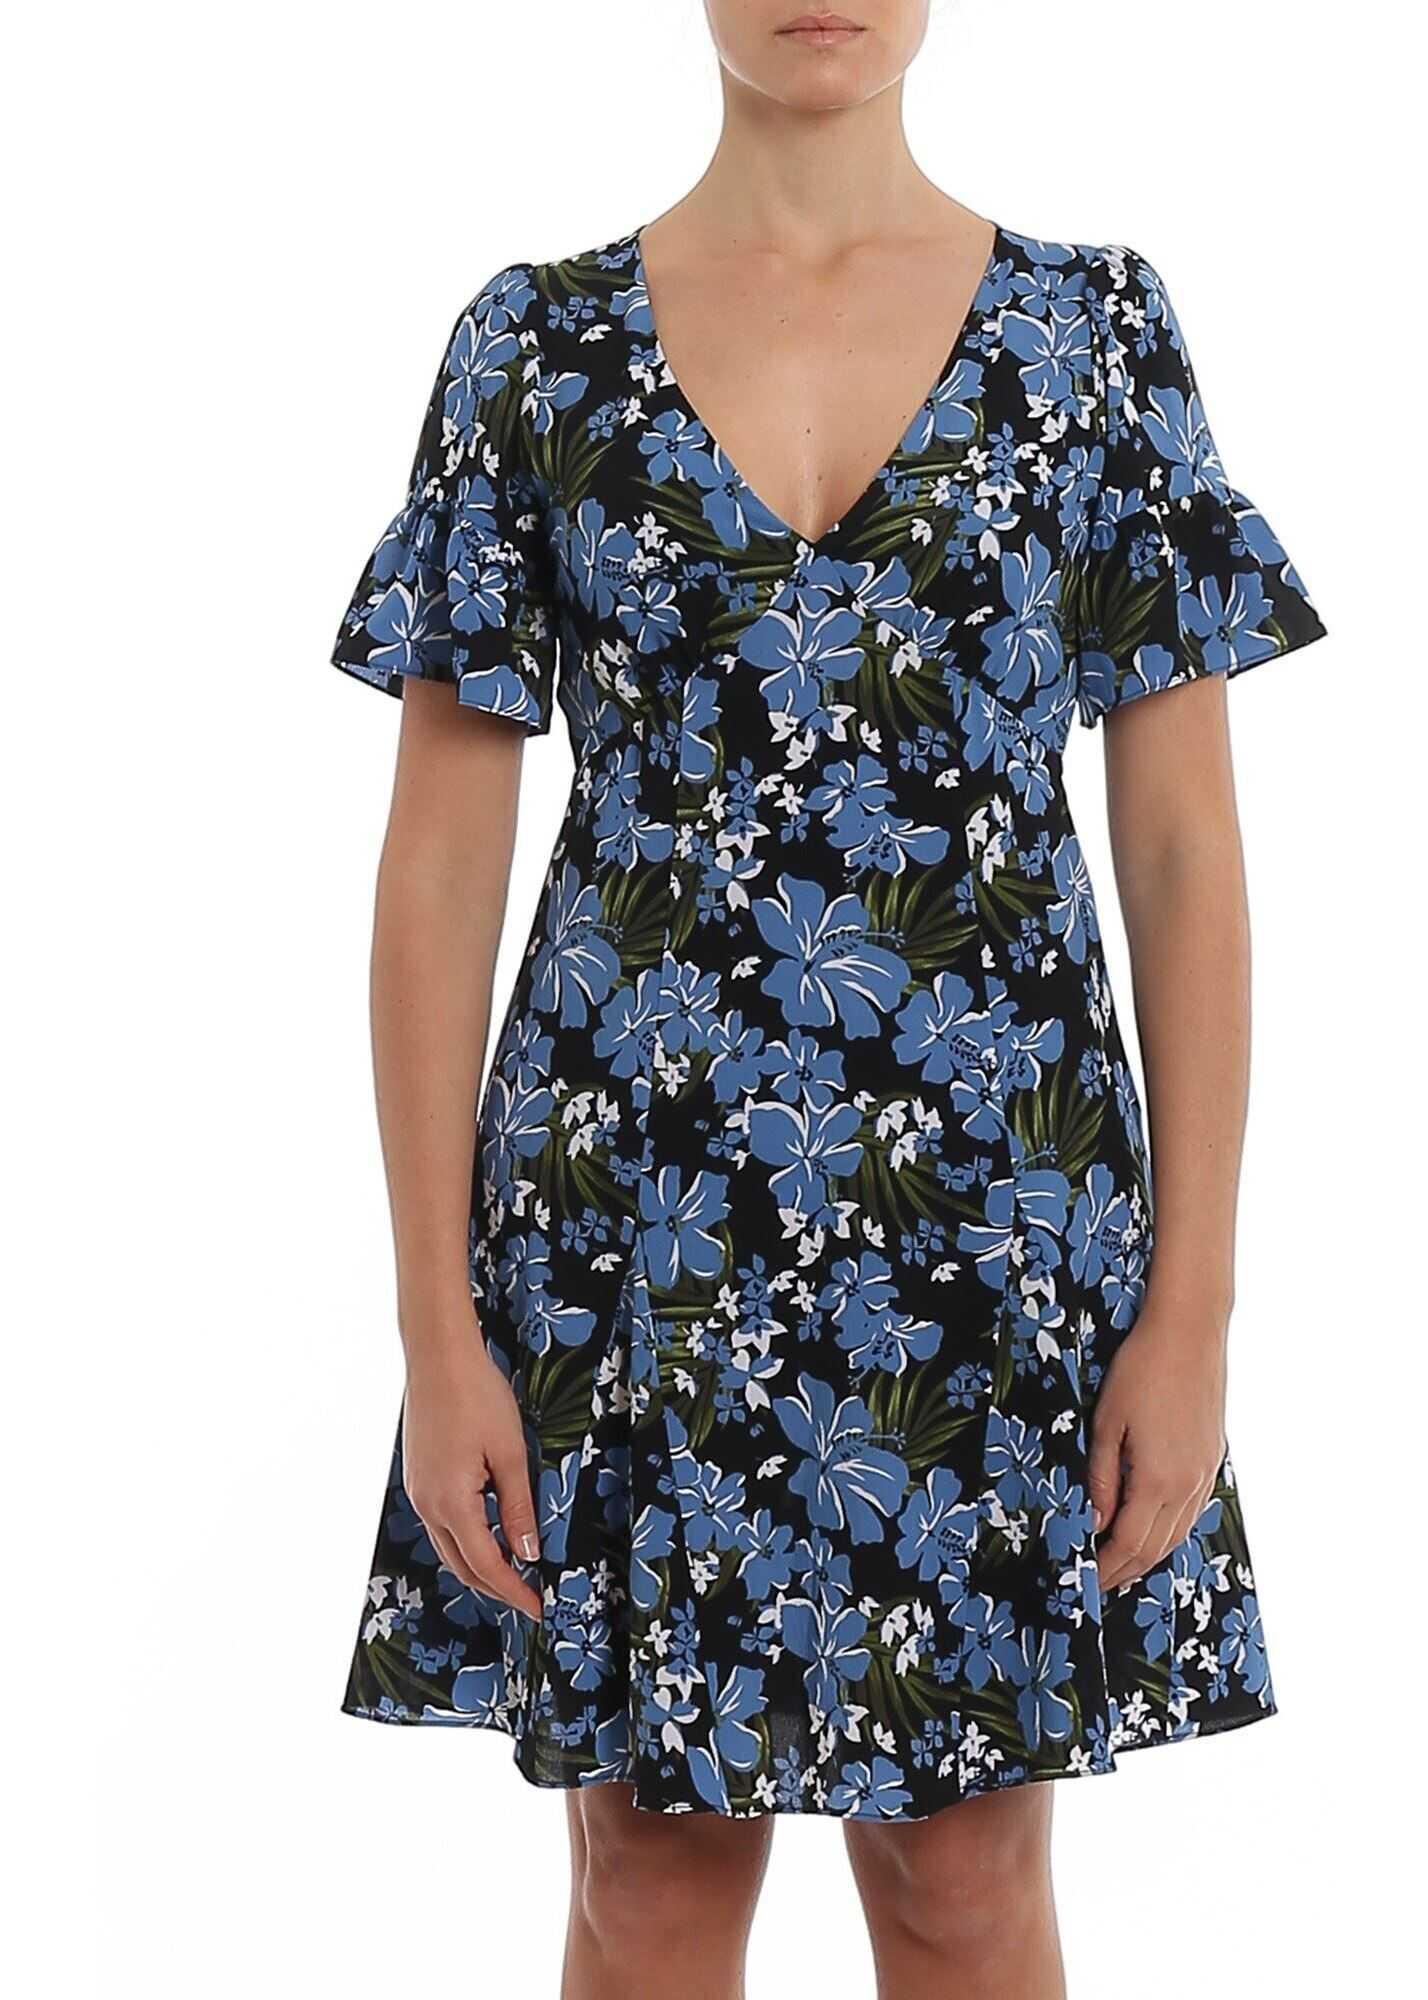 Michael Kors Floral Cady Flared Dress Multi